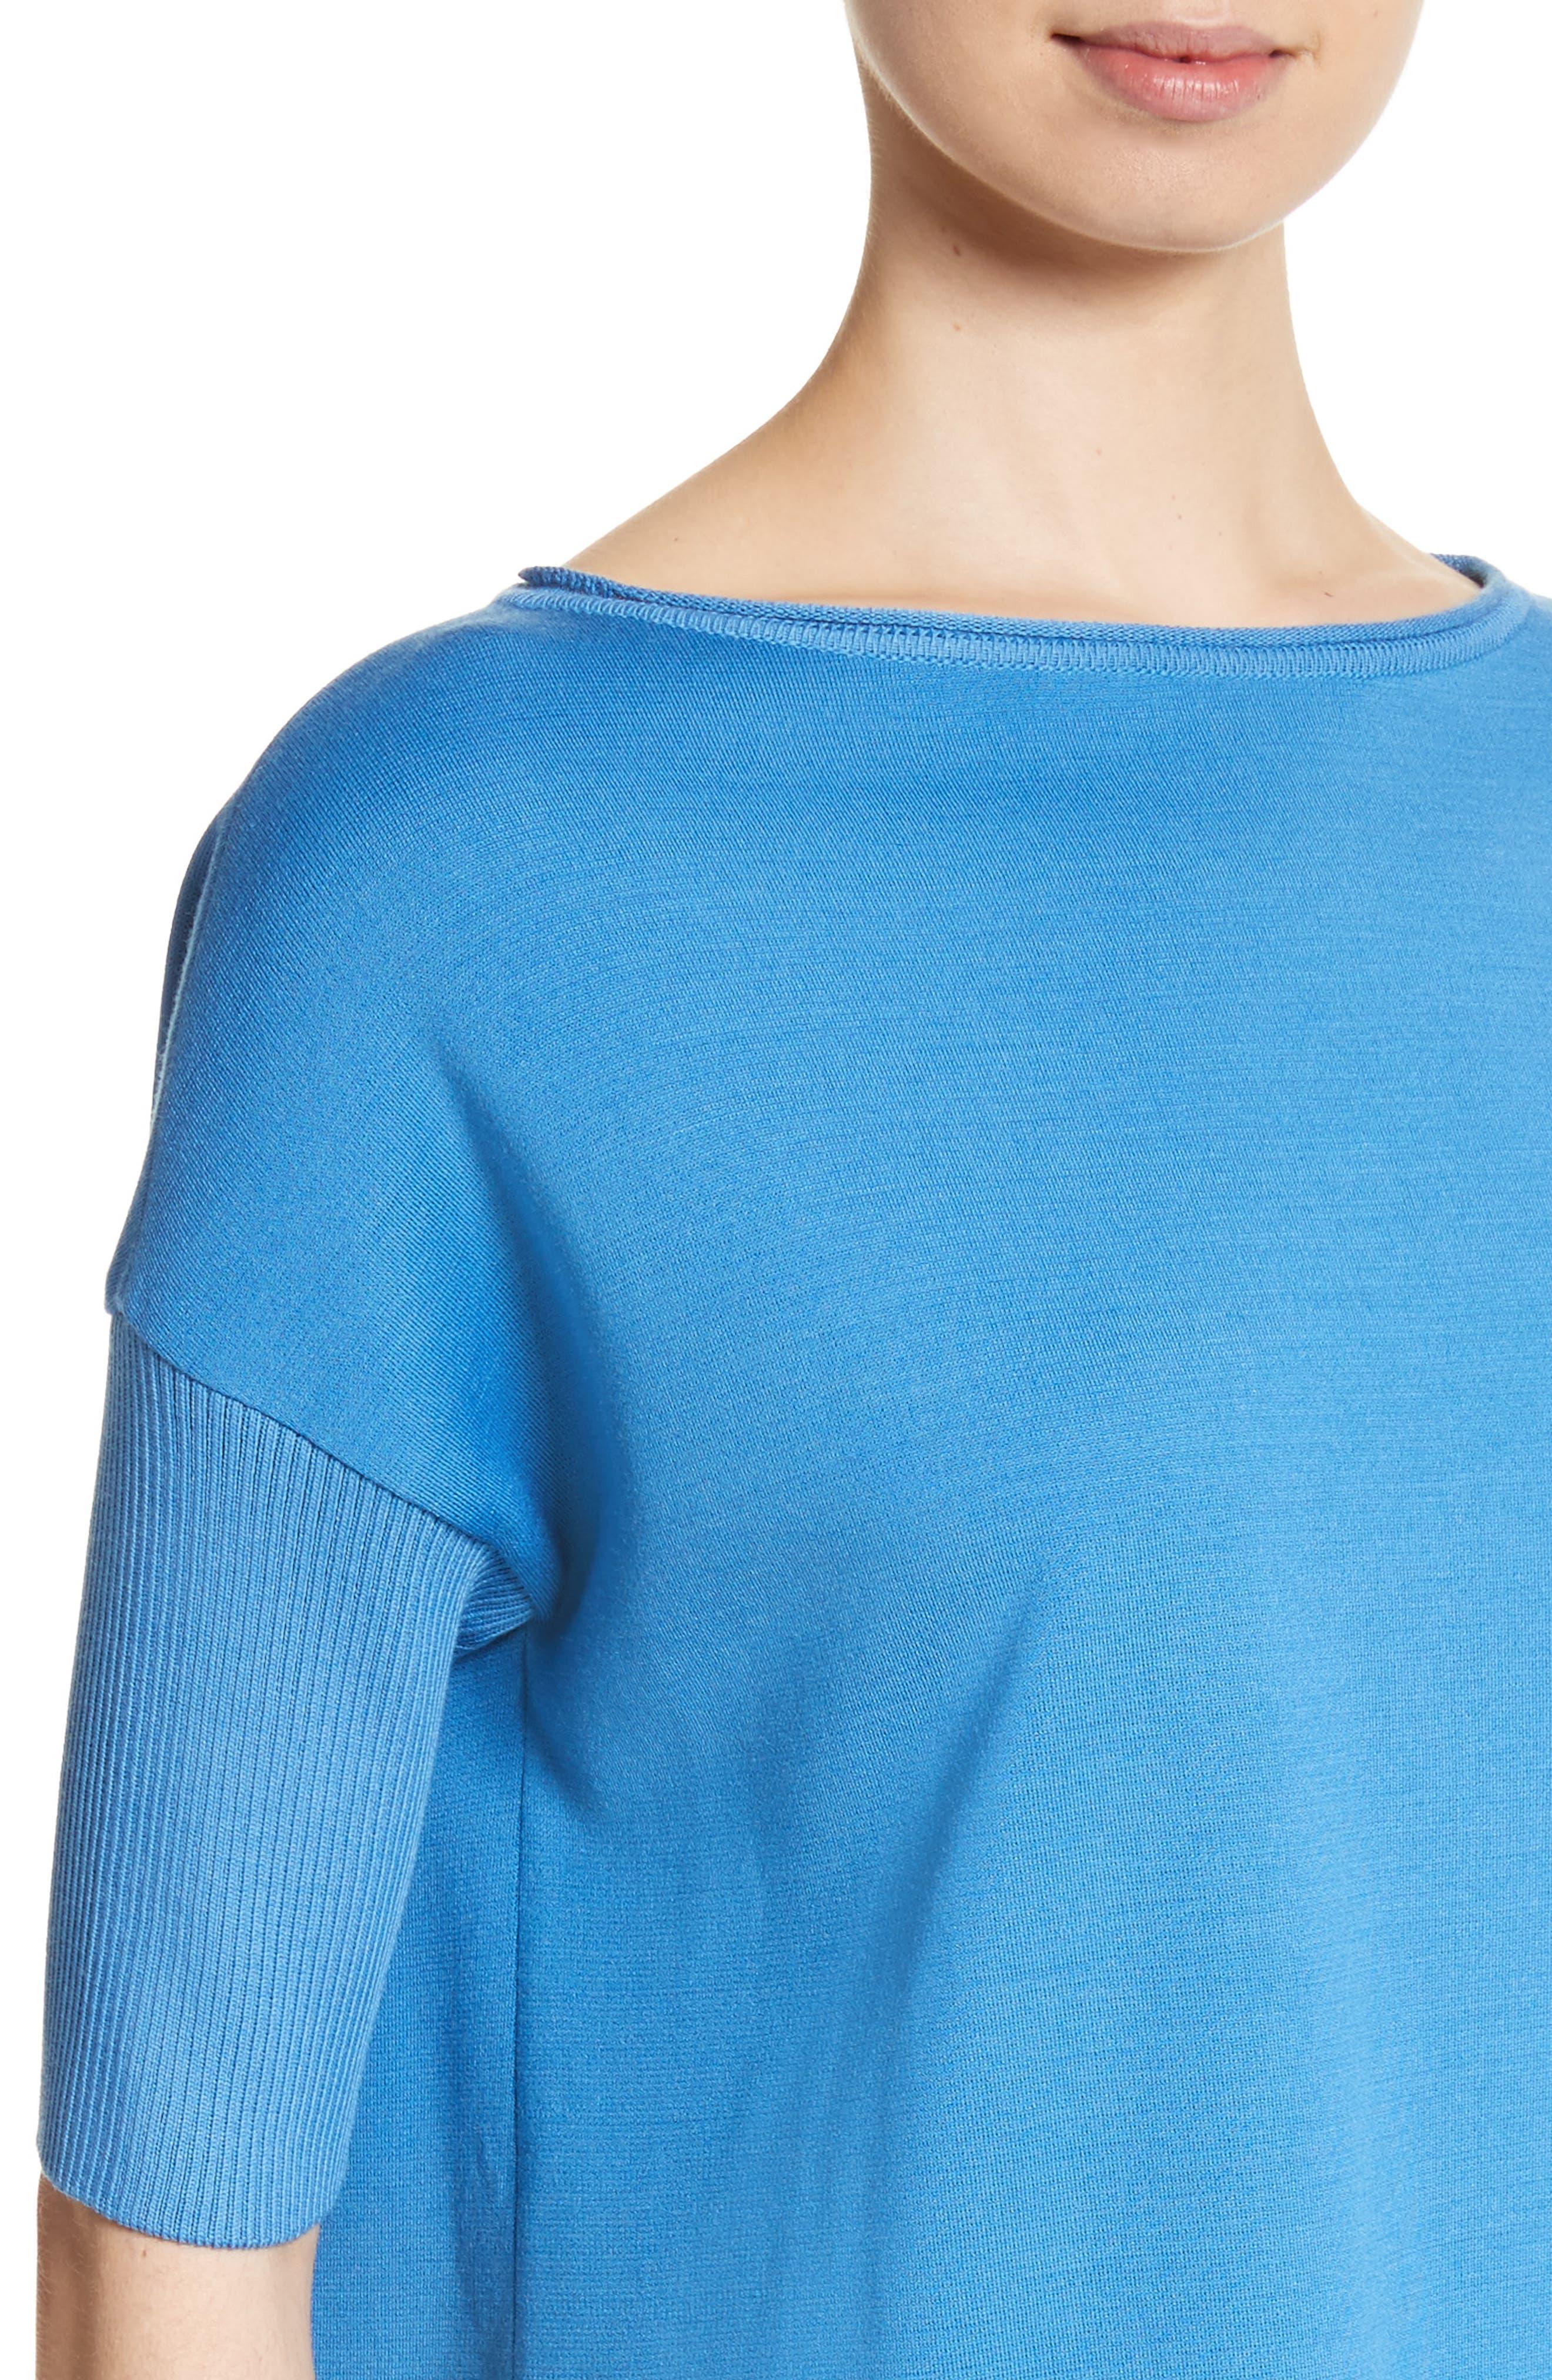 Milano Knit Tunic,                             Alternate thumbnail 4, color,                             Niagara